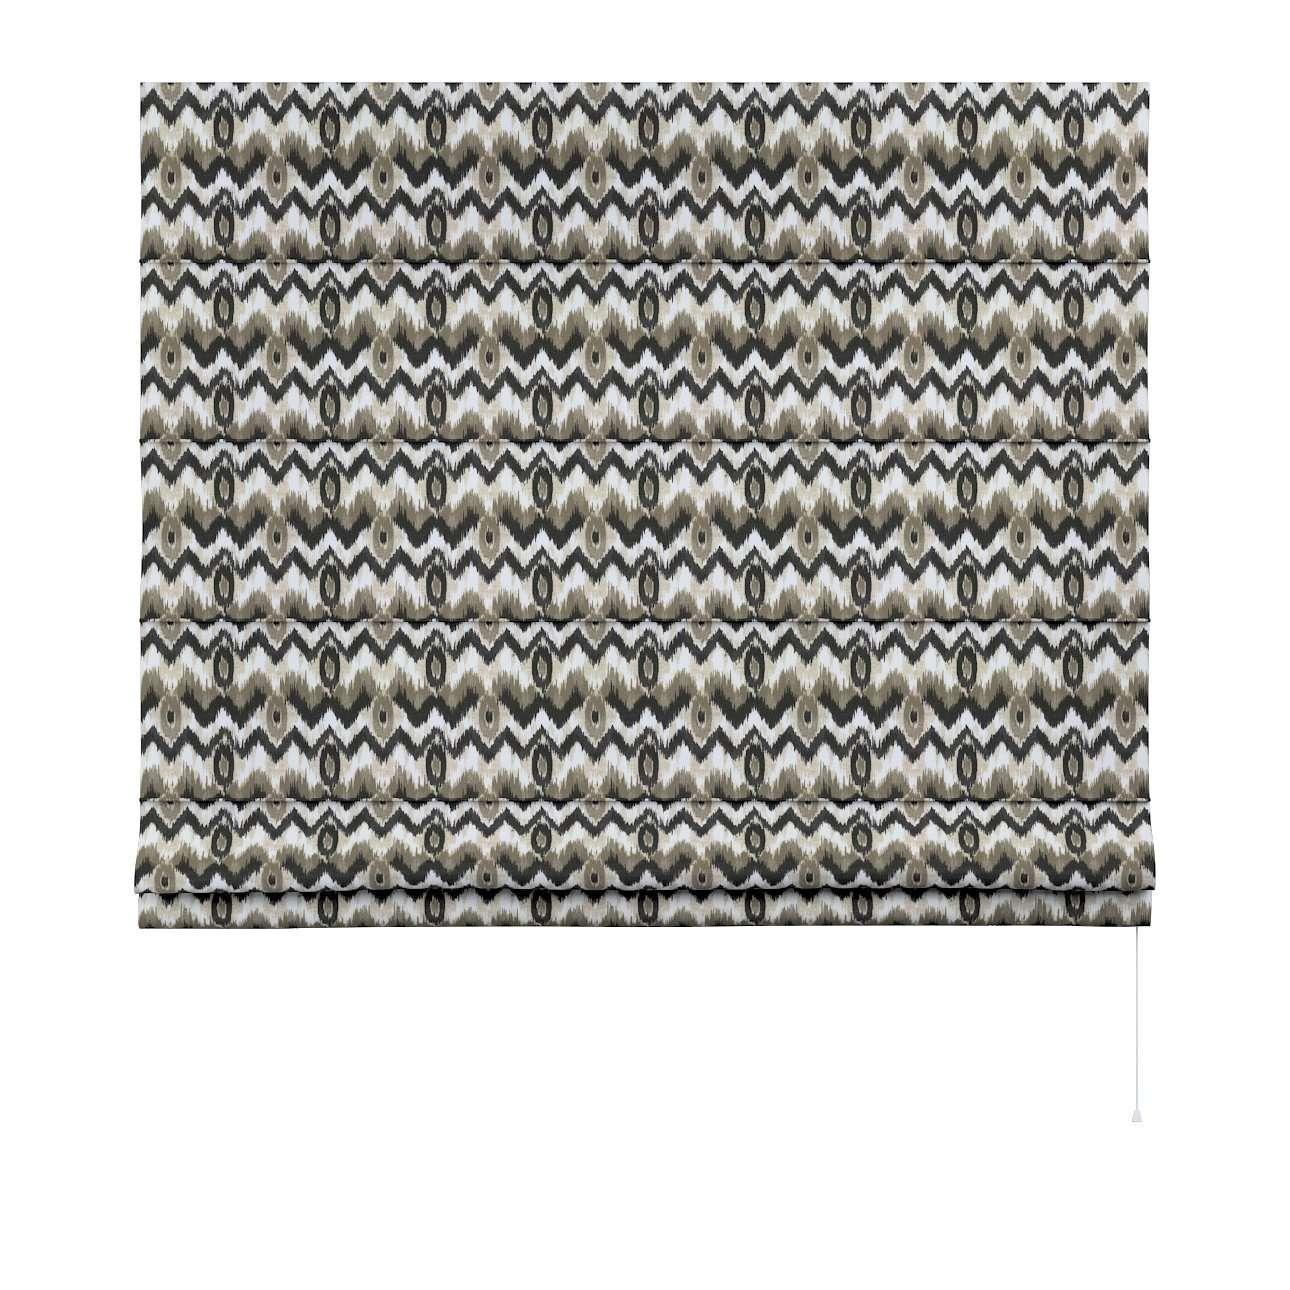 Roleta rzymska Capri w kolekcji Modern, tkanina: 141-88